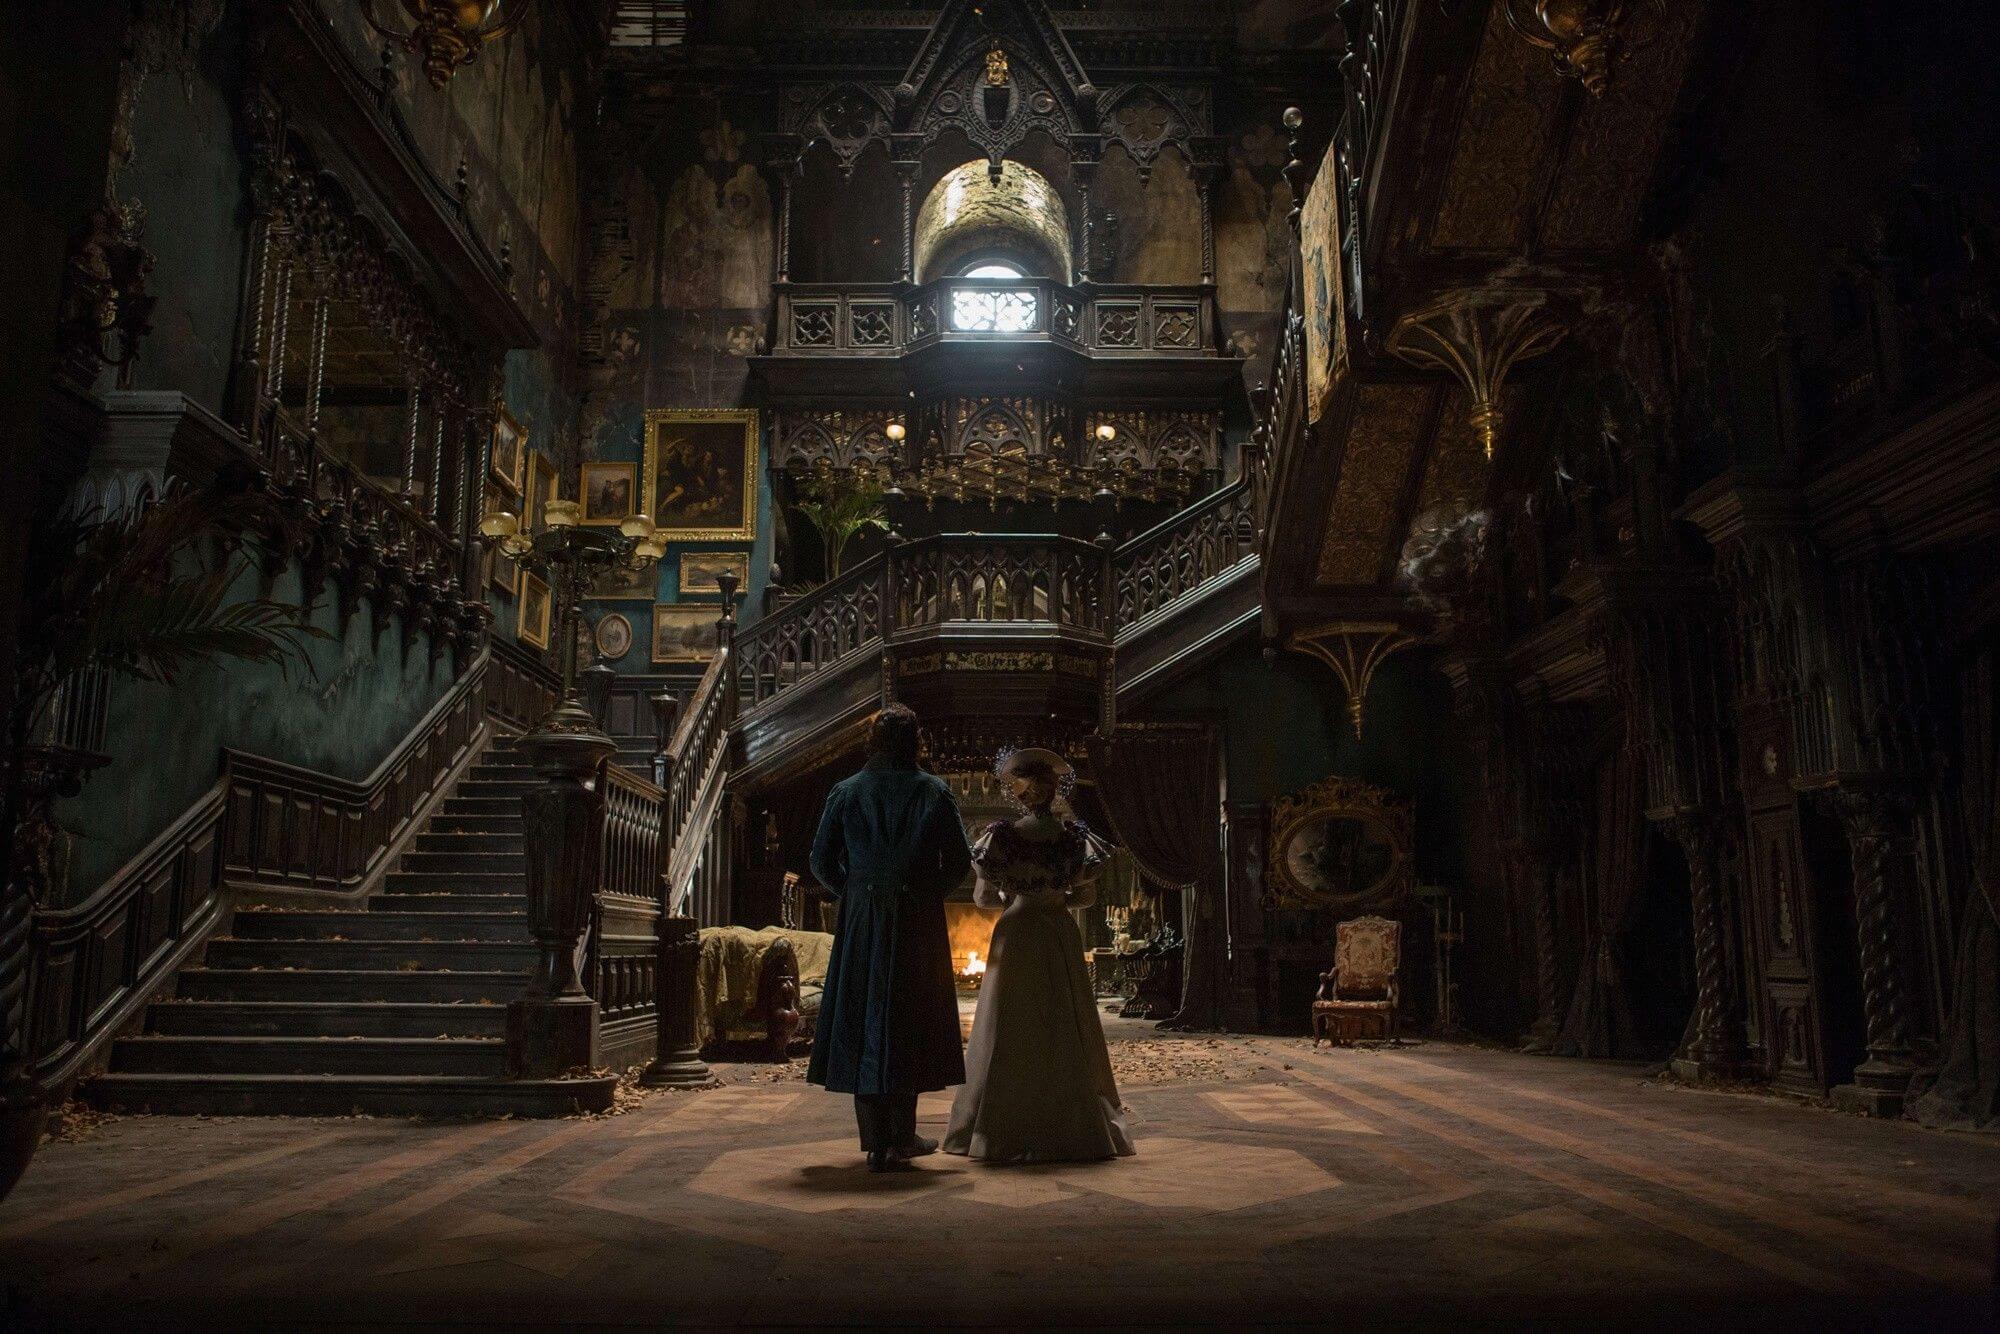 Stunningly designed haunted house set in Crimson Peak (2015)